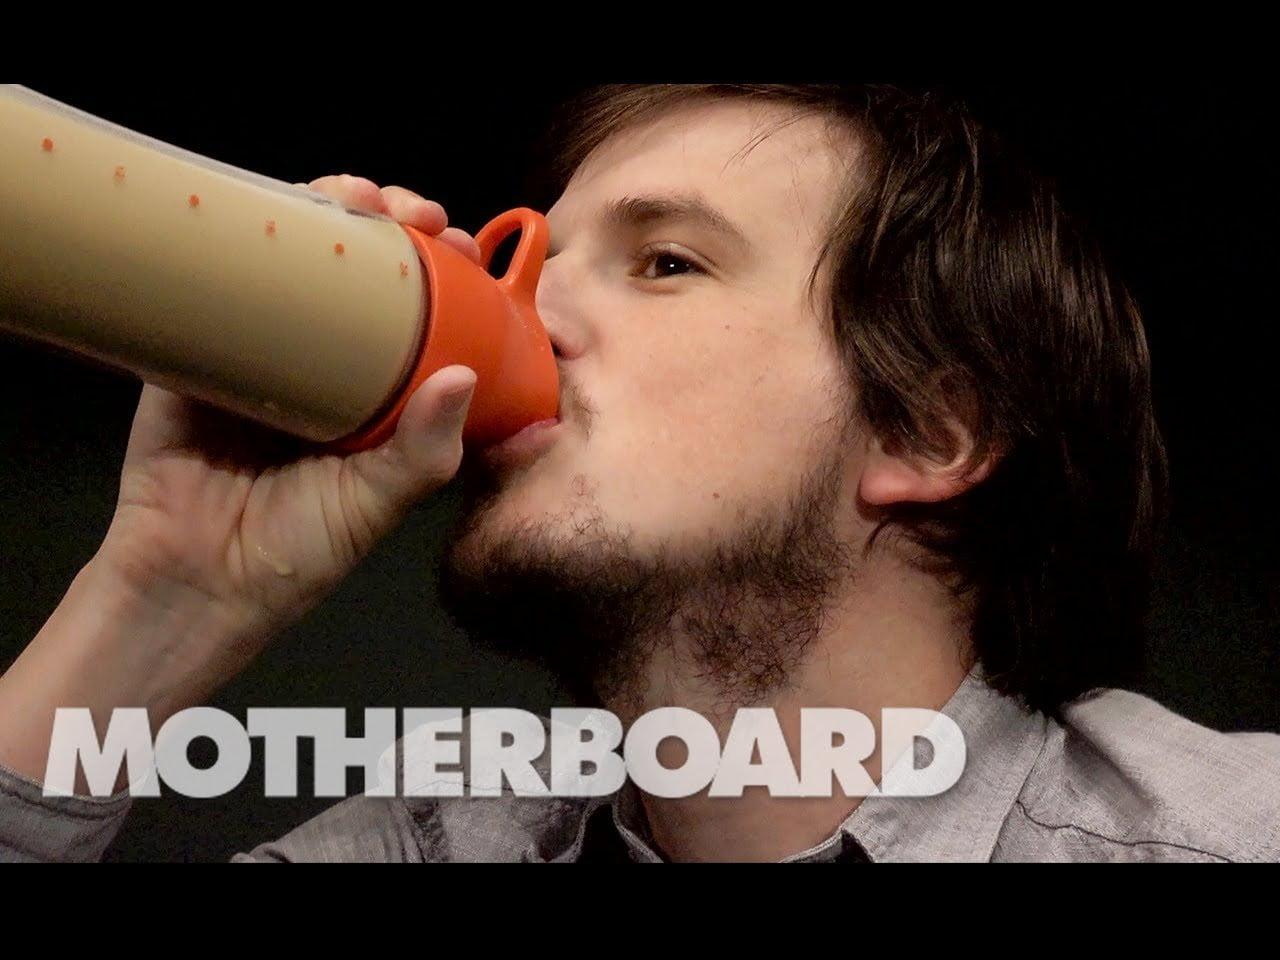 Soylent: How I Stopped Eating for 30 Days